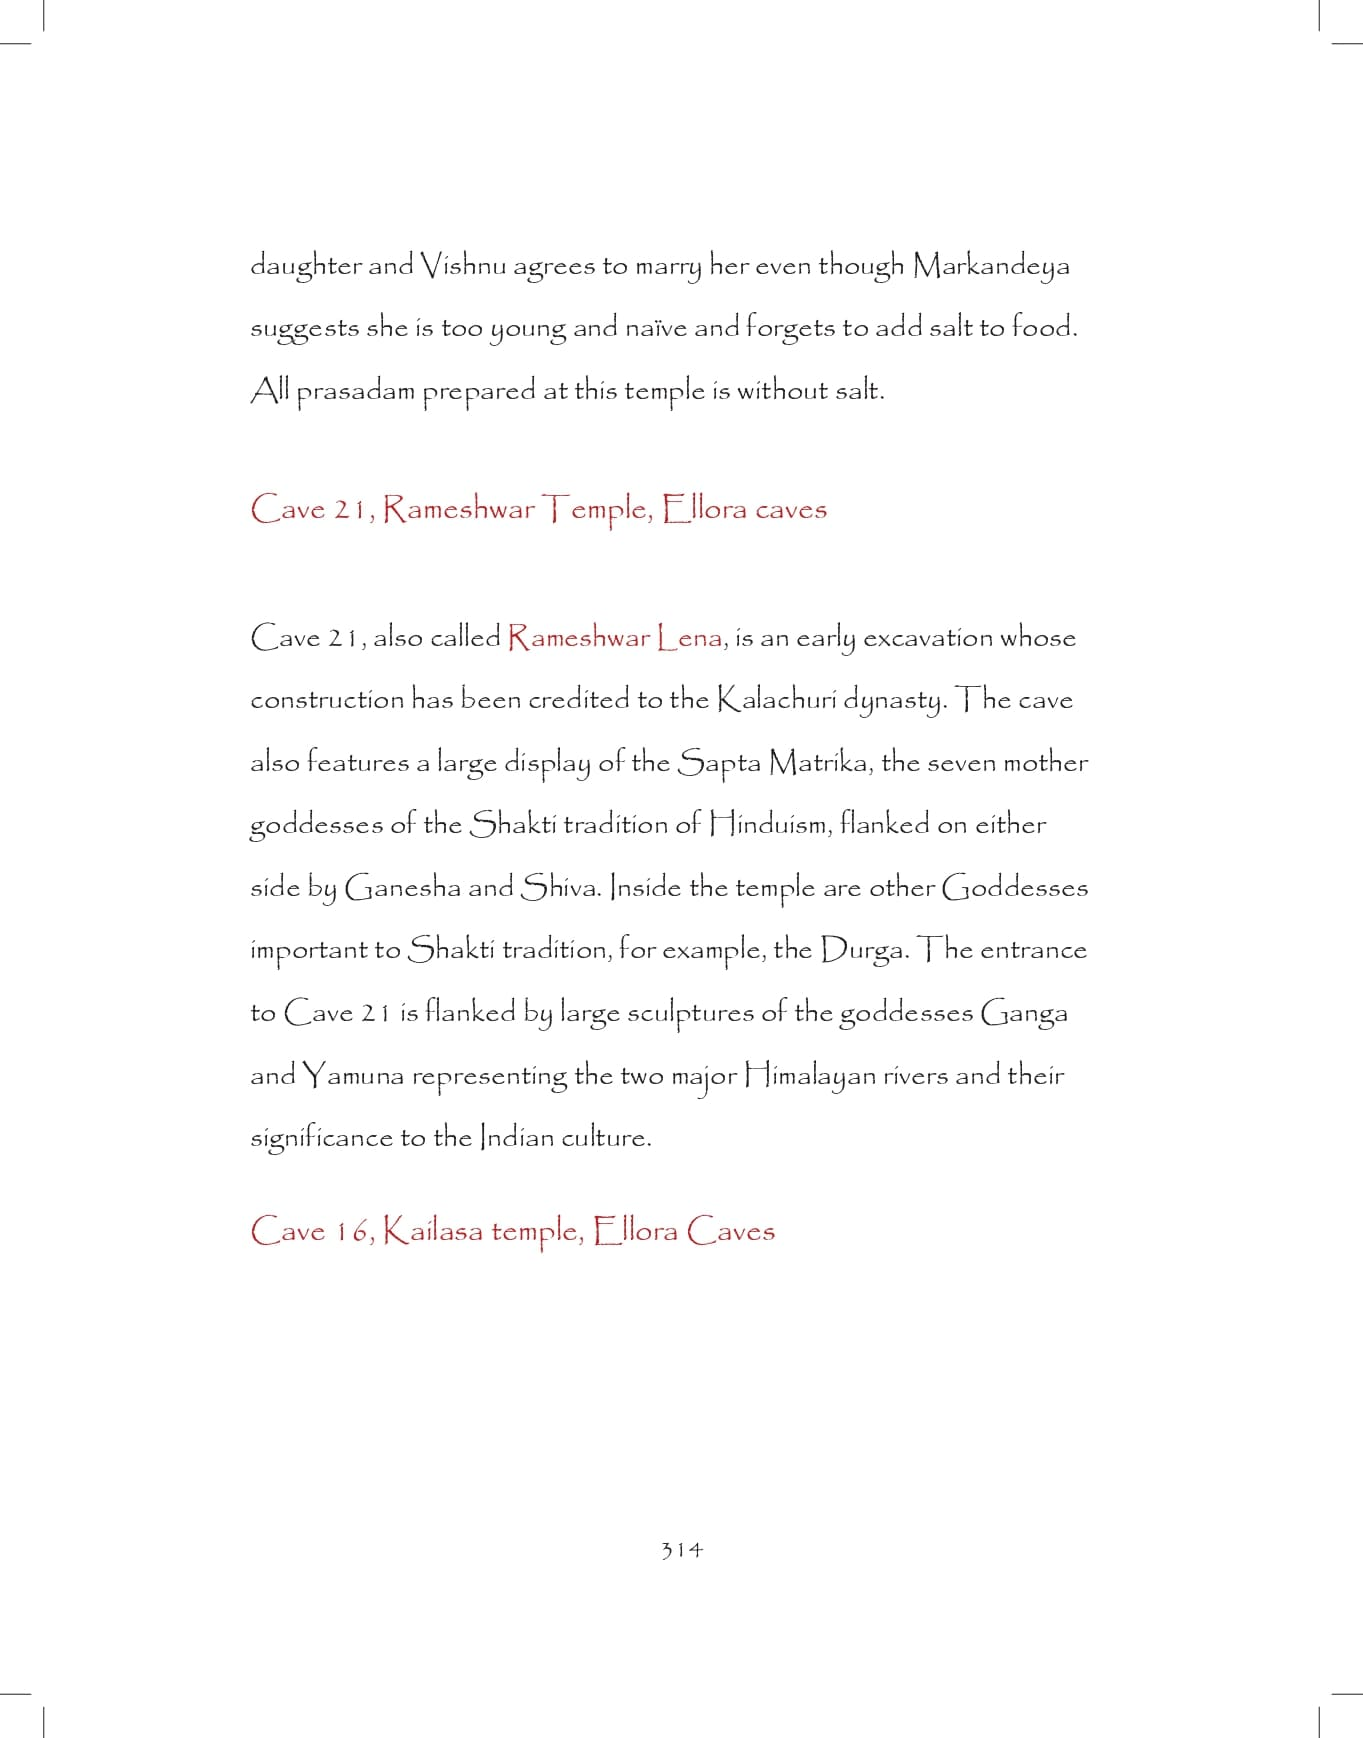 Ganesh-print_pages-to-jpg-0314.jpg